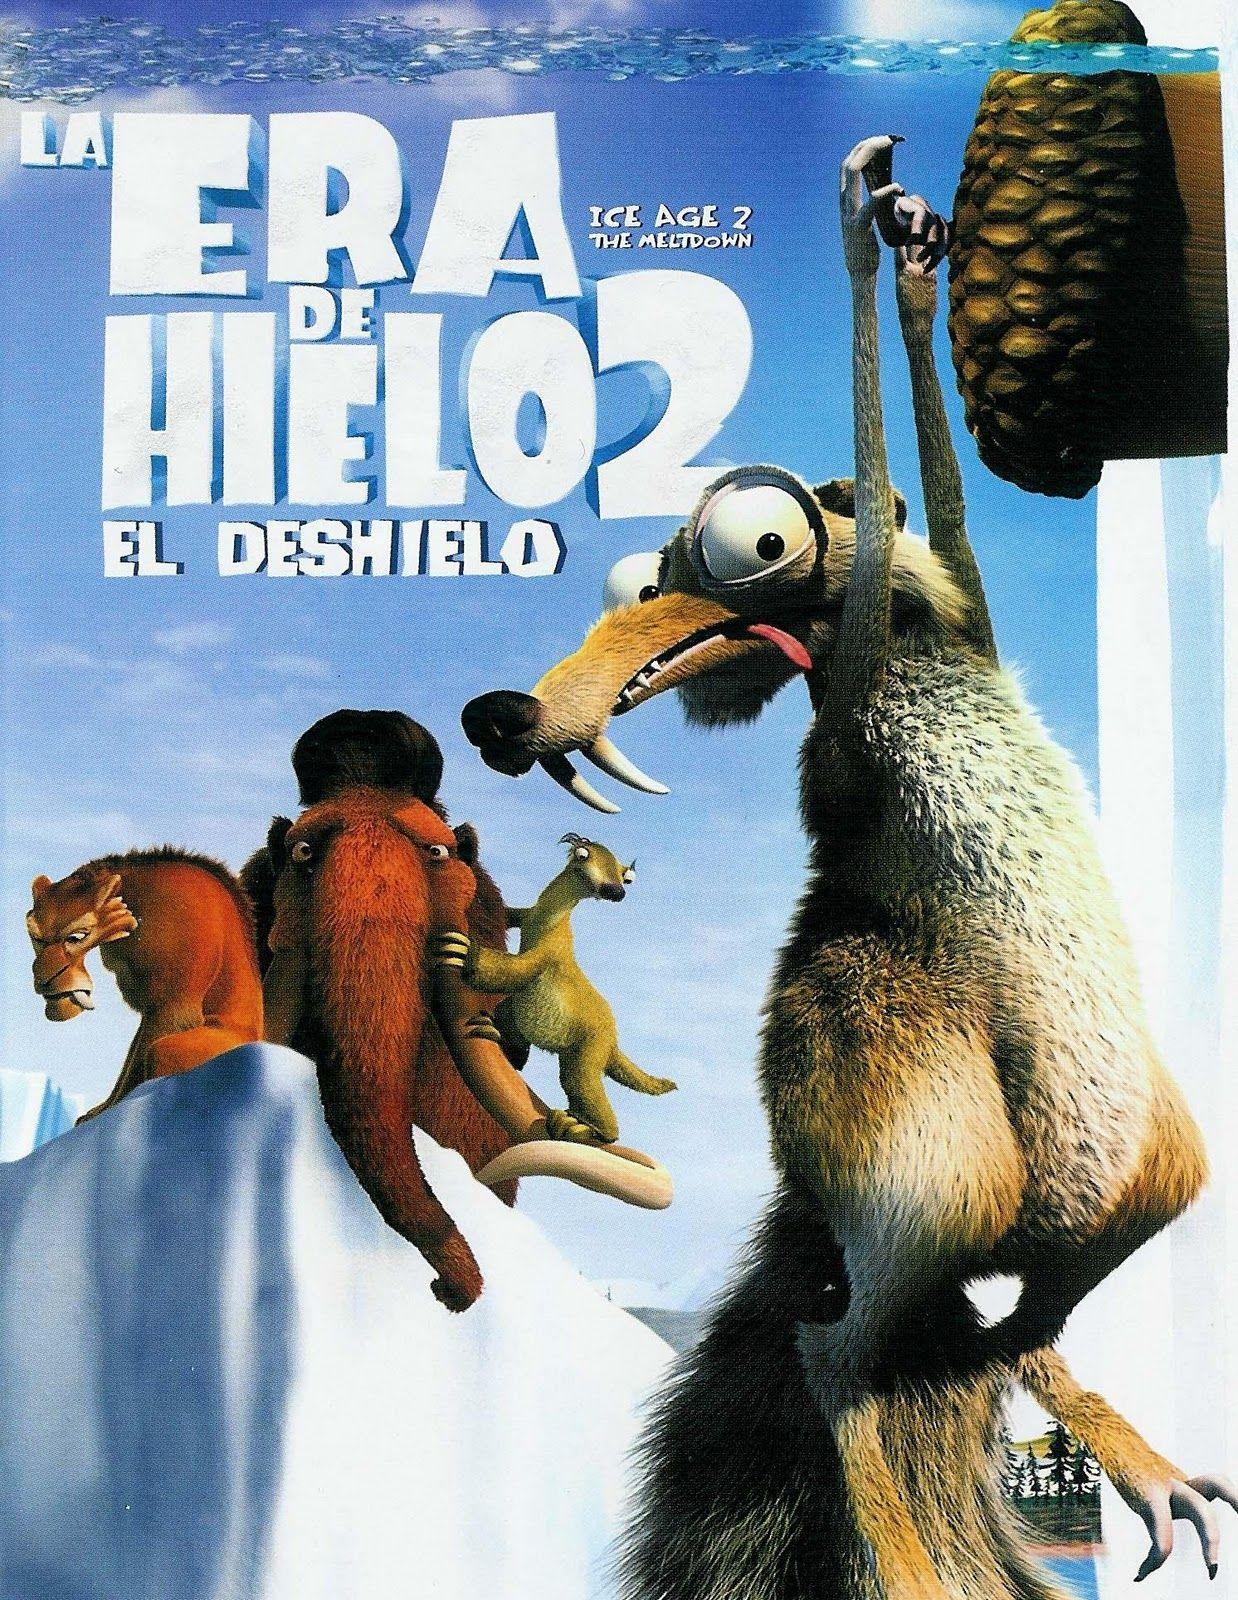 La Era De Hielo 2 Animated Characters Tv Entertainment Movies